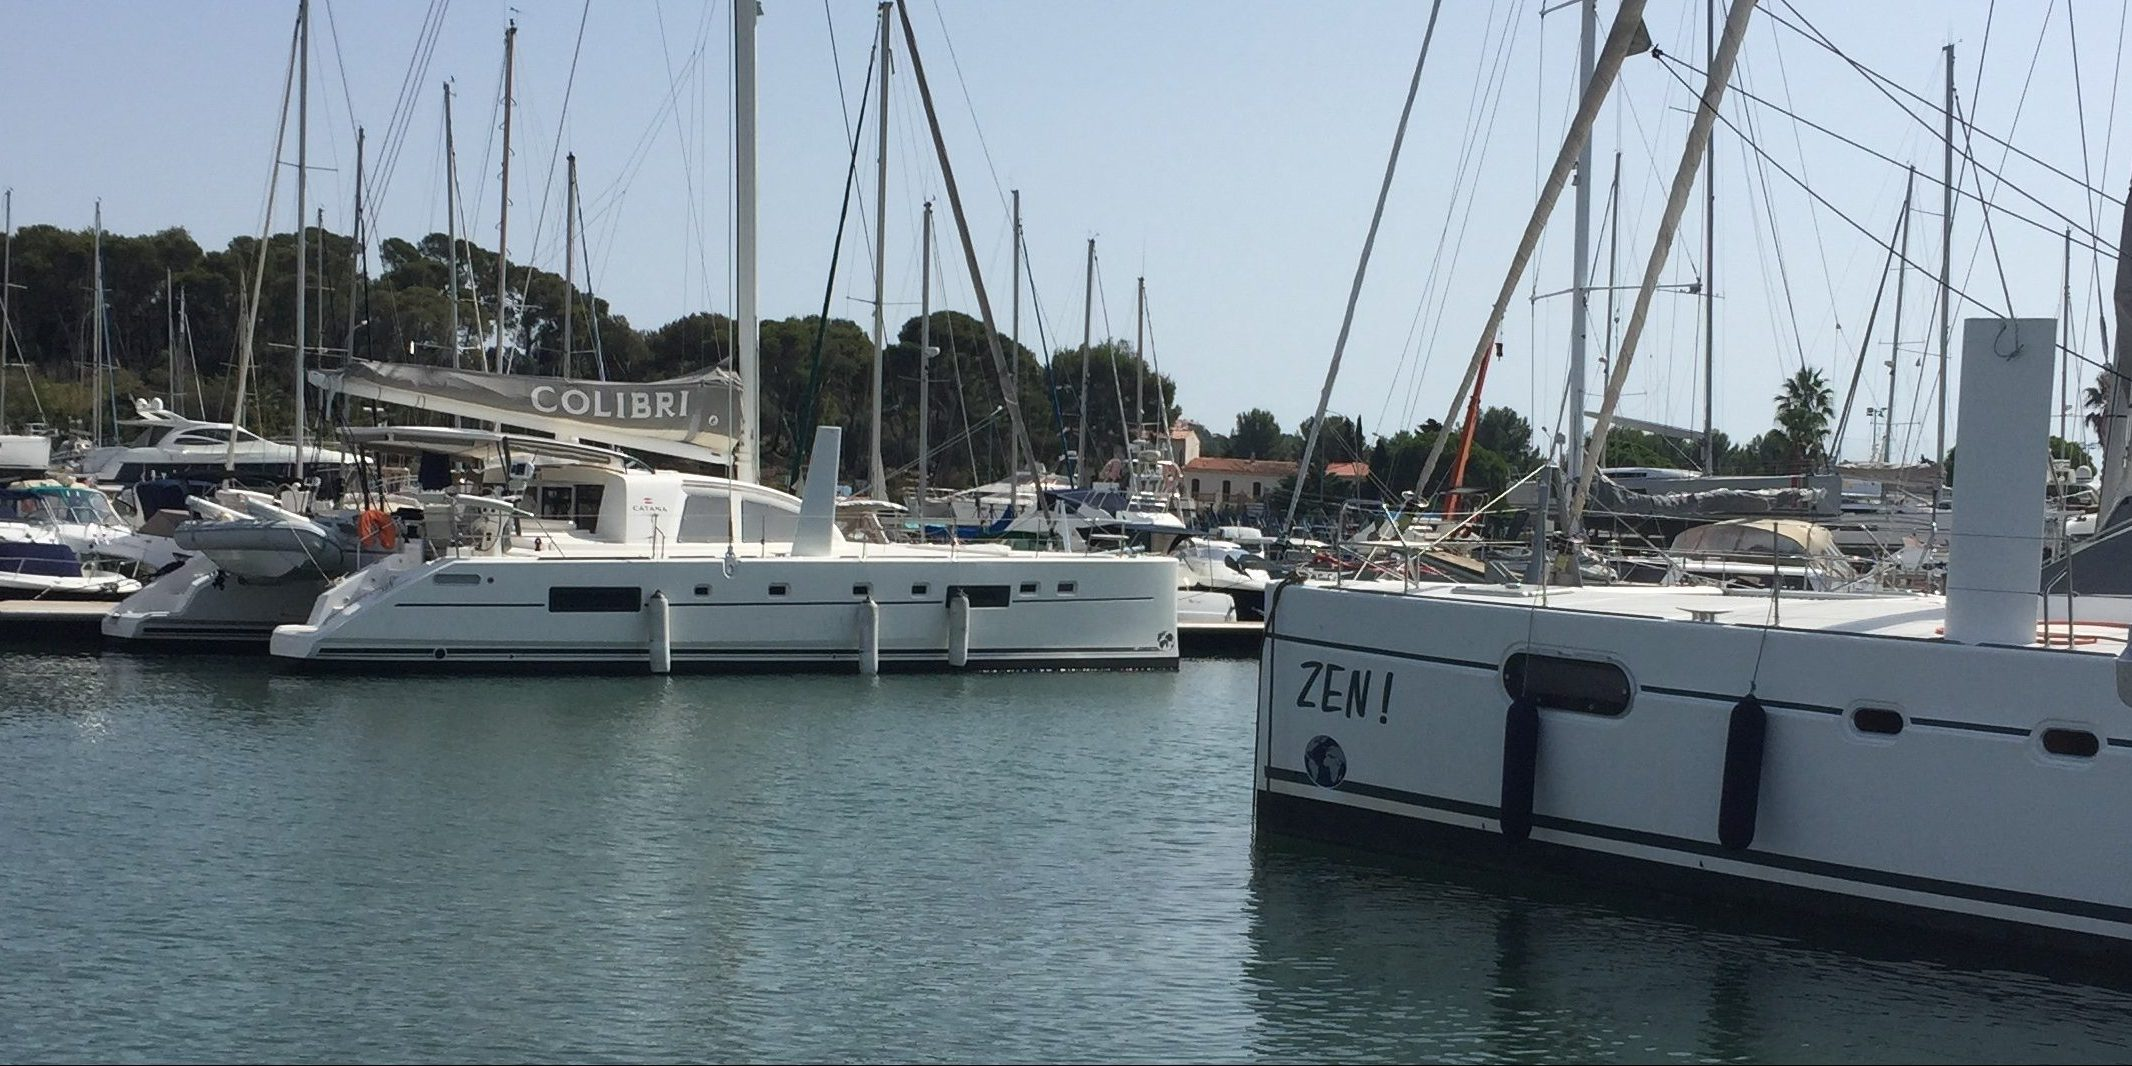 Catarmaran Catana 55 delivered to Port Pin Rolland